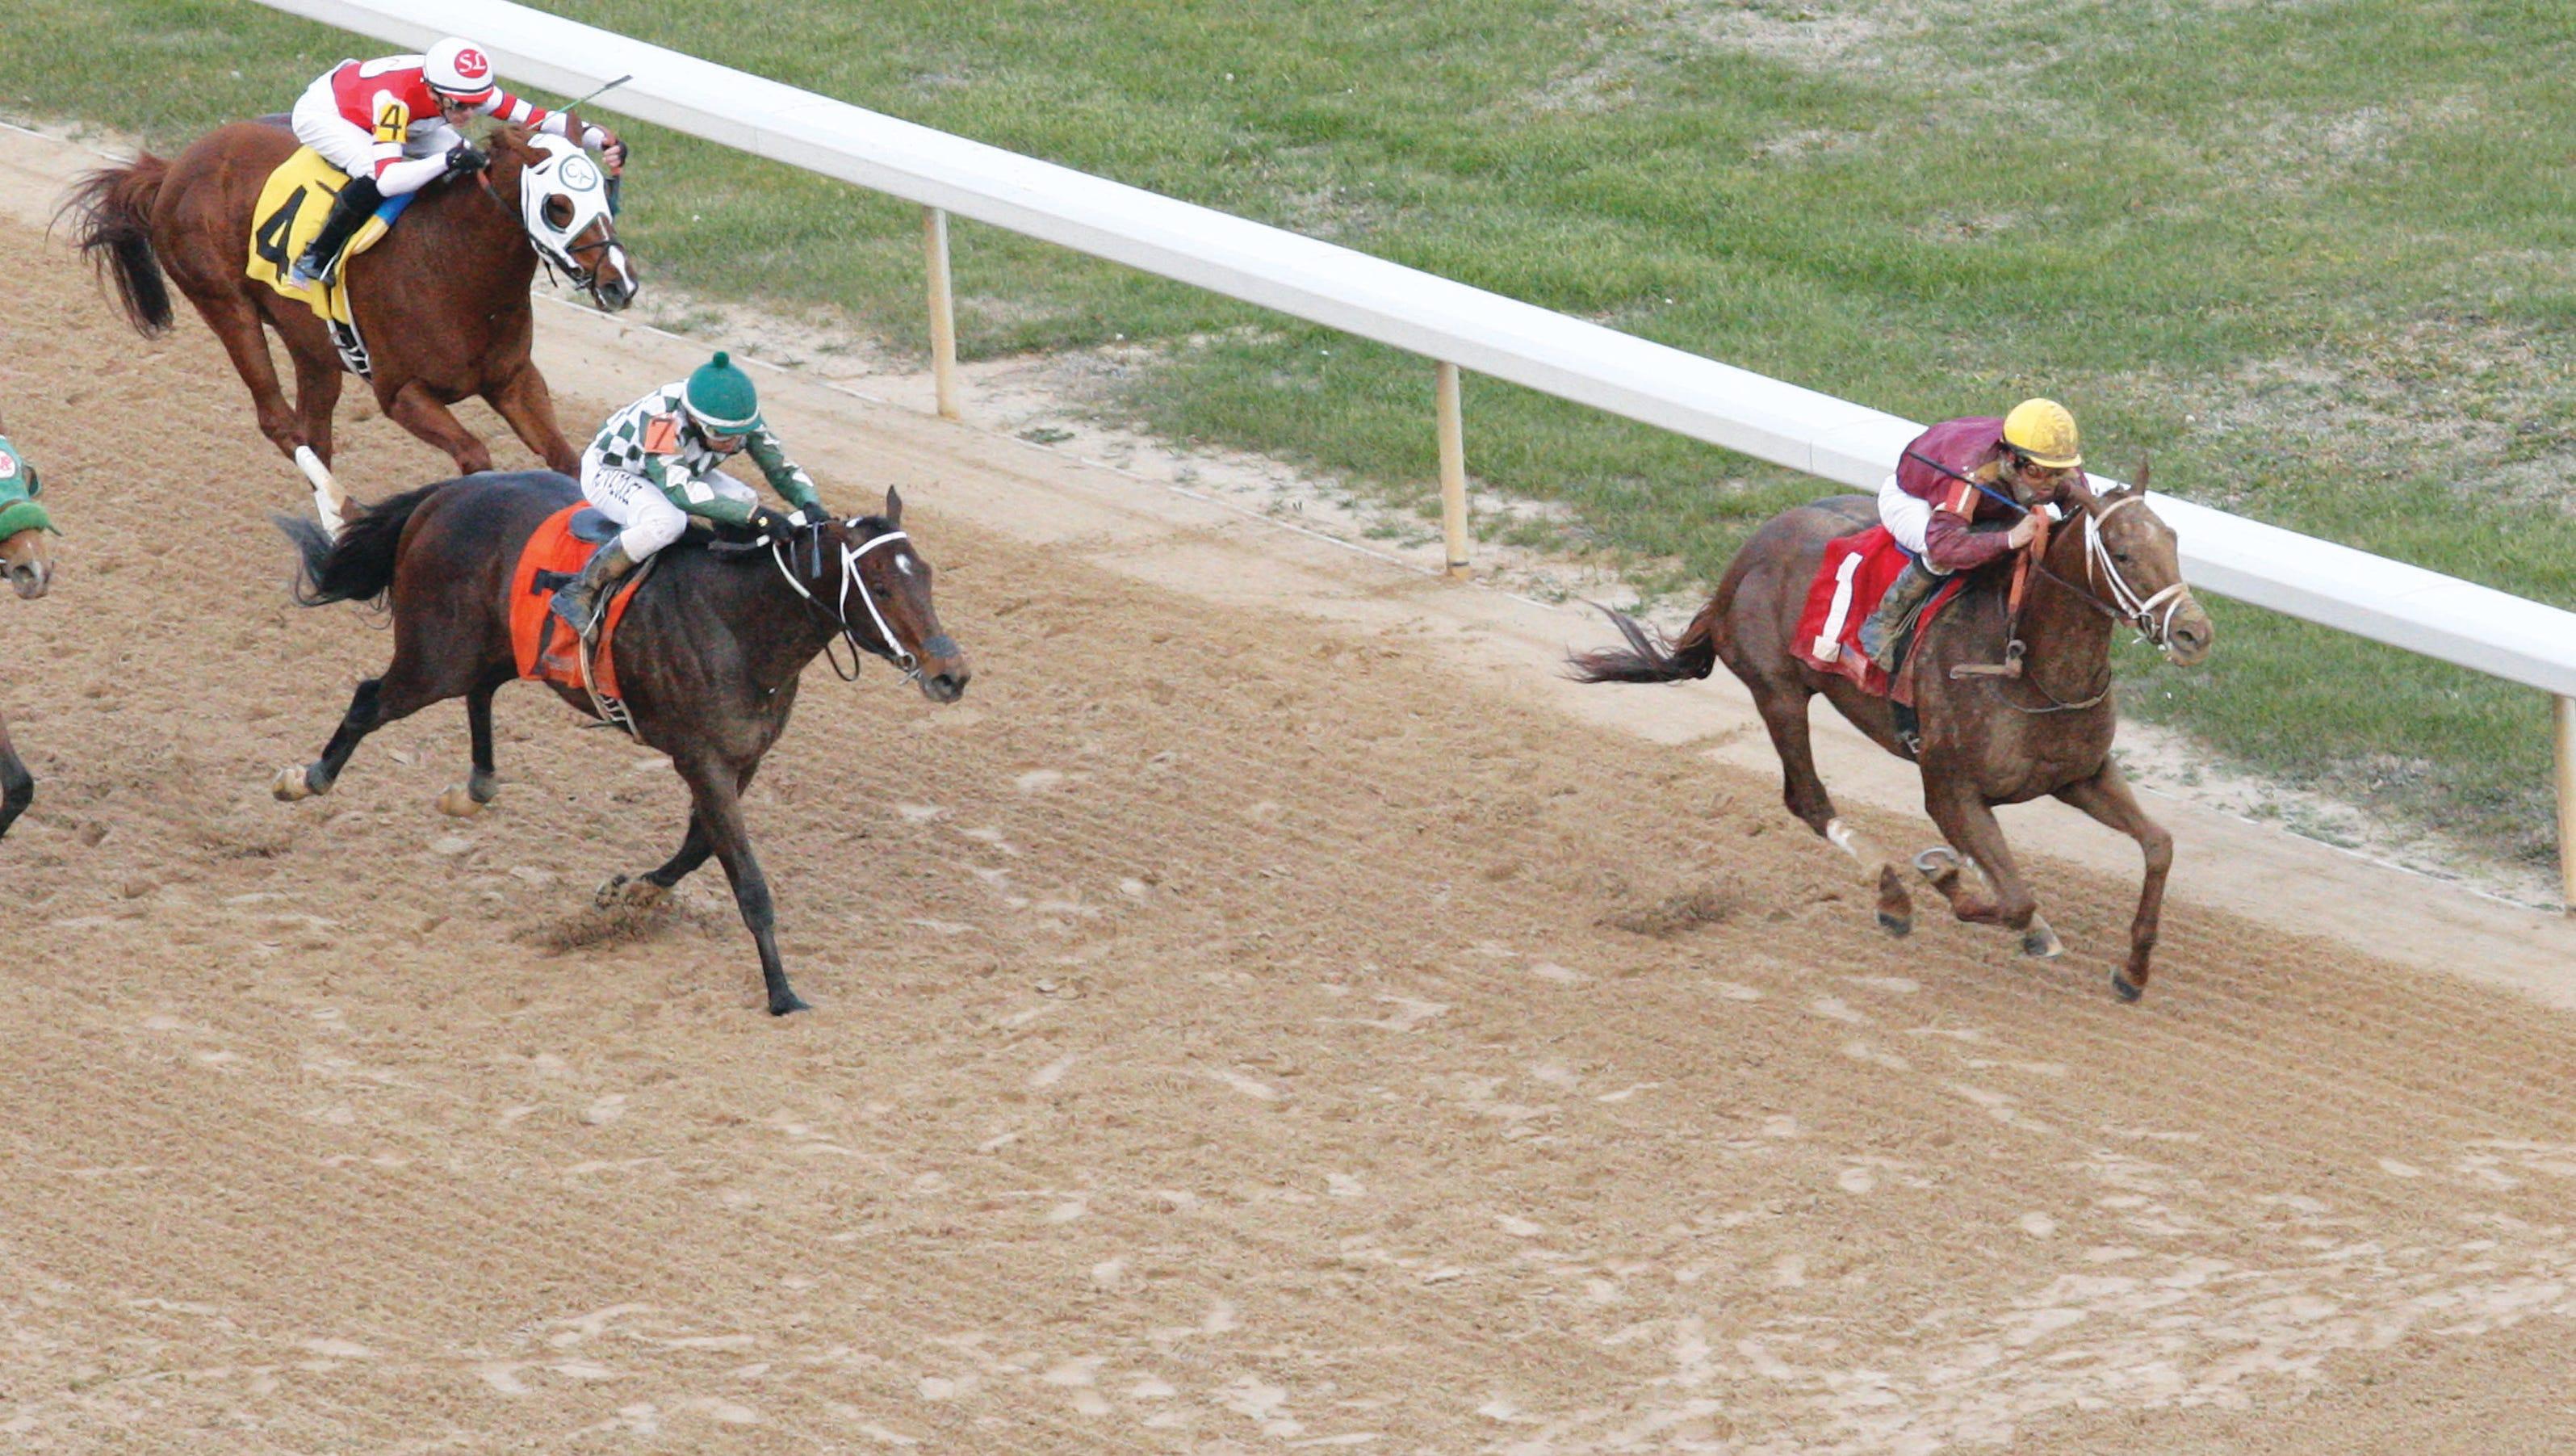 Route du Kentucky Derby/Kentucky oaks 2015 635572970265306112-Far-Right---The-Smarty-Jones---The-8th-Running---01-19-15---R08---OP---Aerial